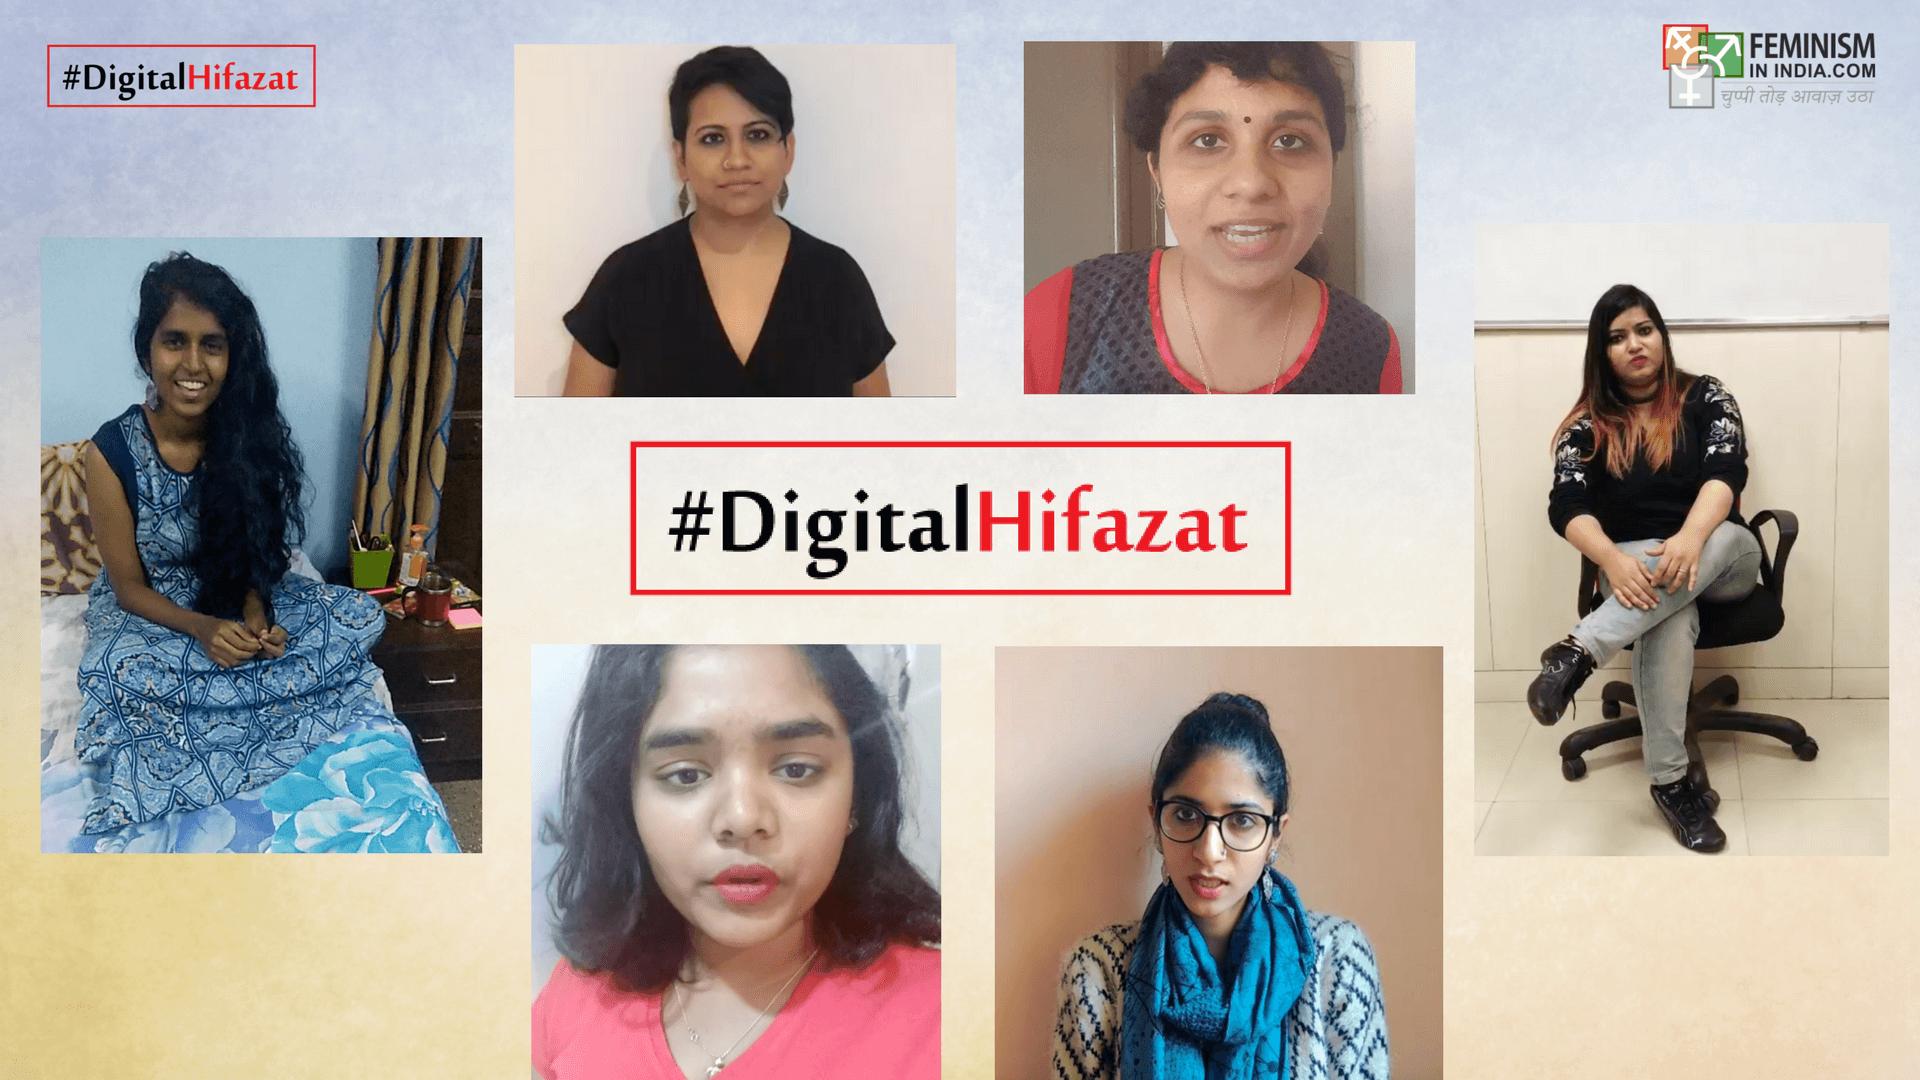 Watch: How Do Young Women Experience The Internet? | #DigitalHifazat